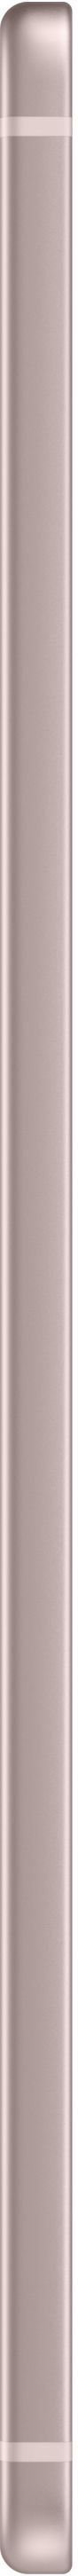 Планшет Samsung Galaxy Tab S6 Lite Wi-Fi 64GB (SM-P610NZIASEK) Pink от Територія твоєї техніки - 3